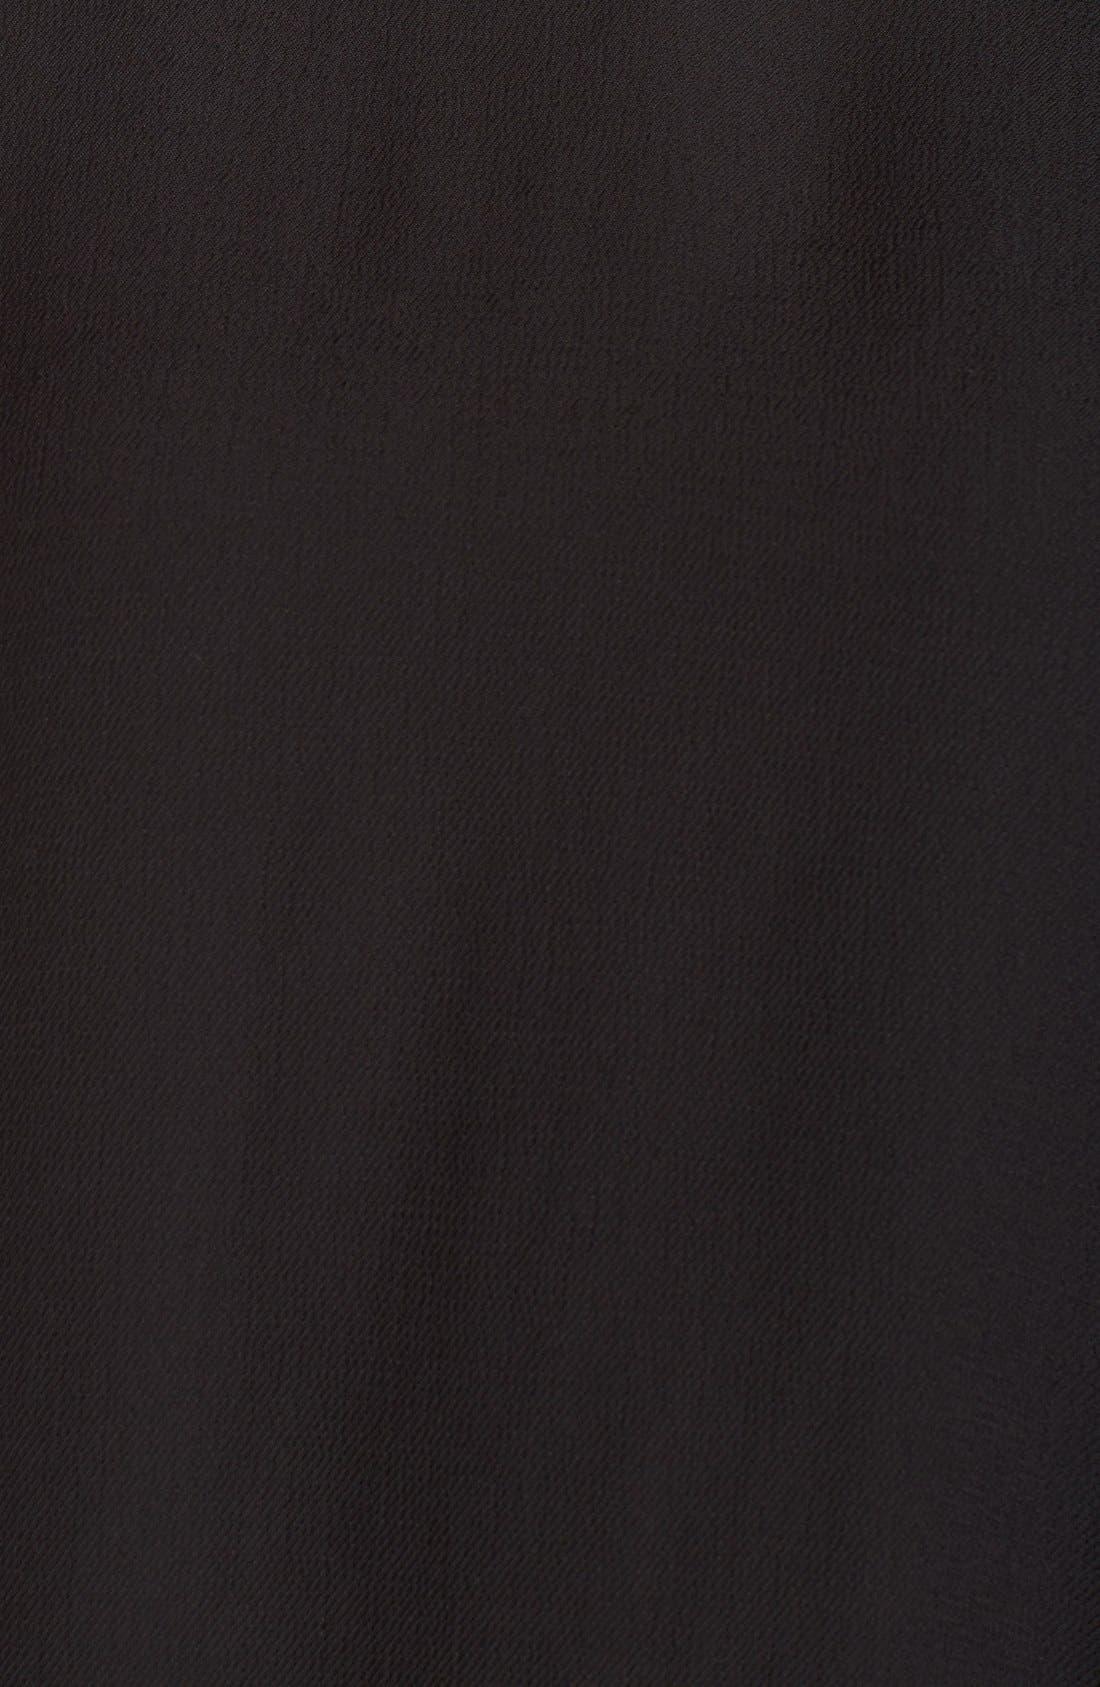 Drop Waist Knit Dress,                             Alternate thumbnail 7, color,